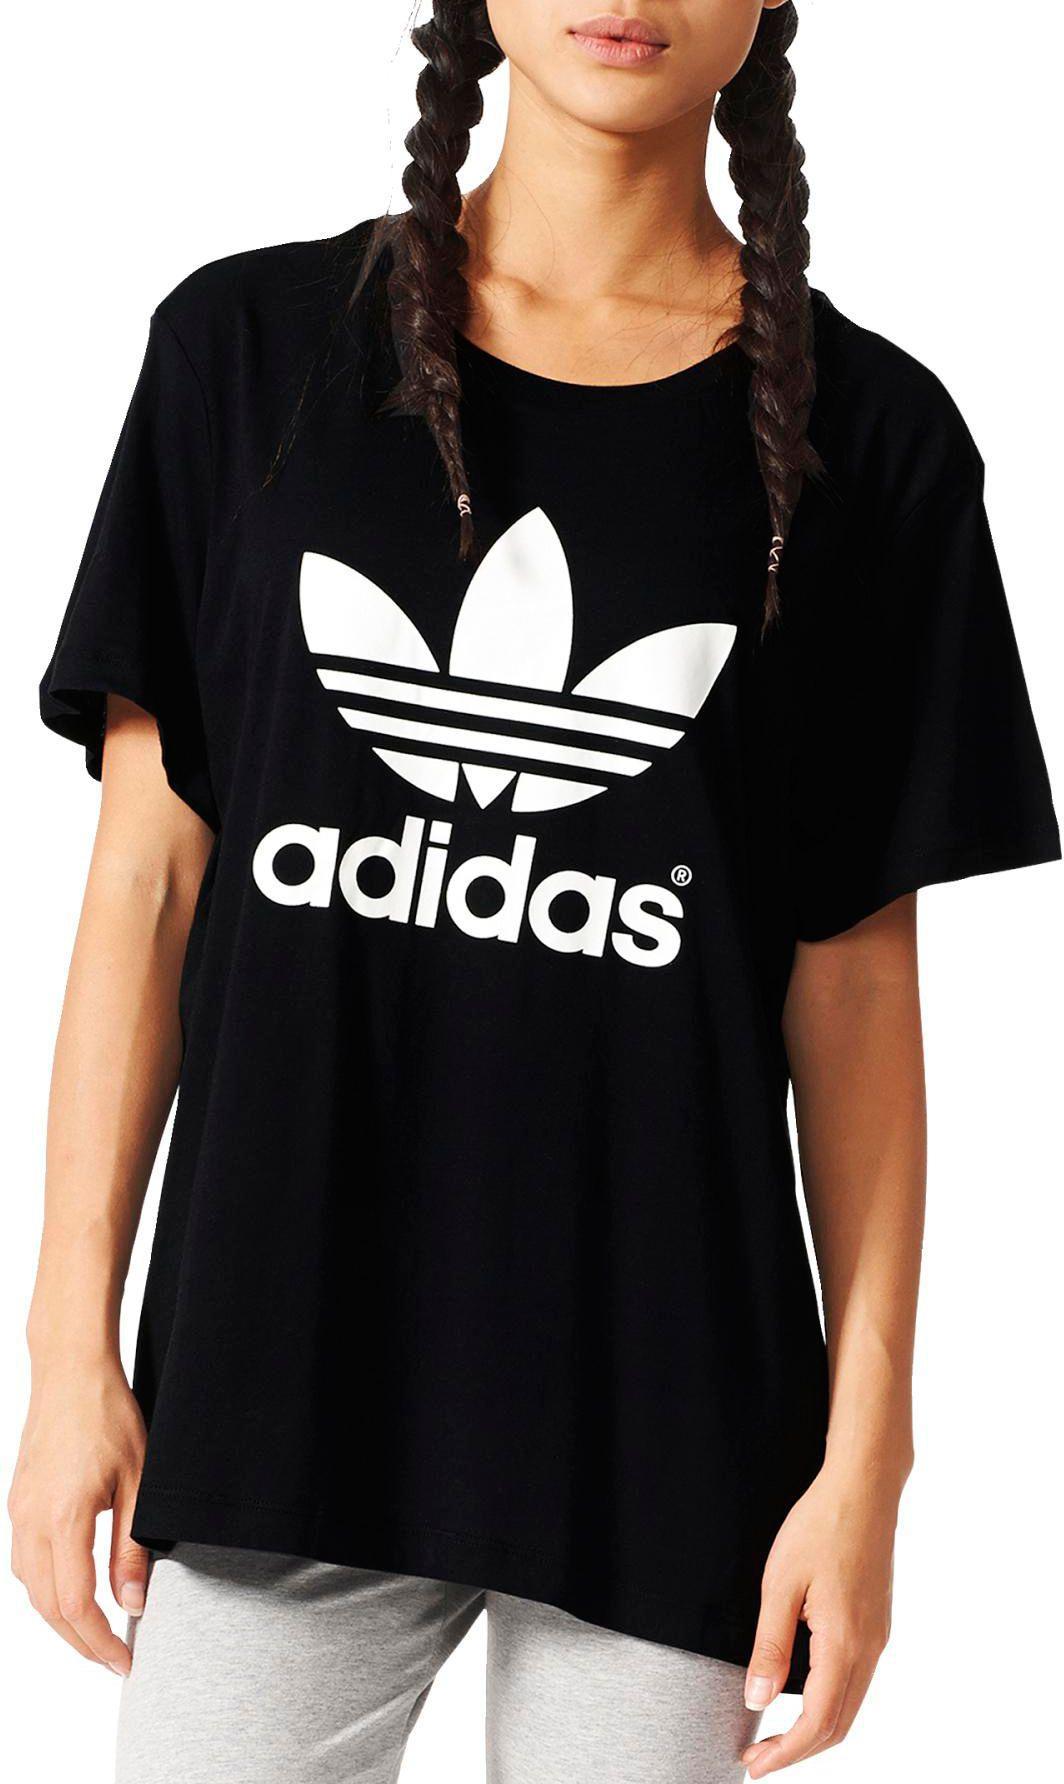 adidas black shirt